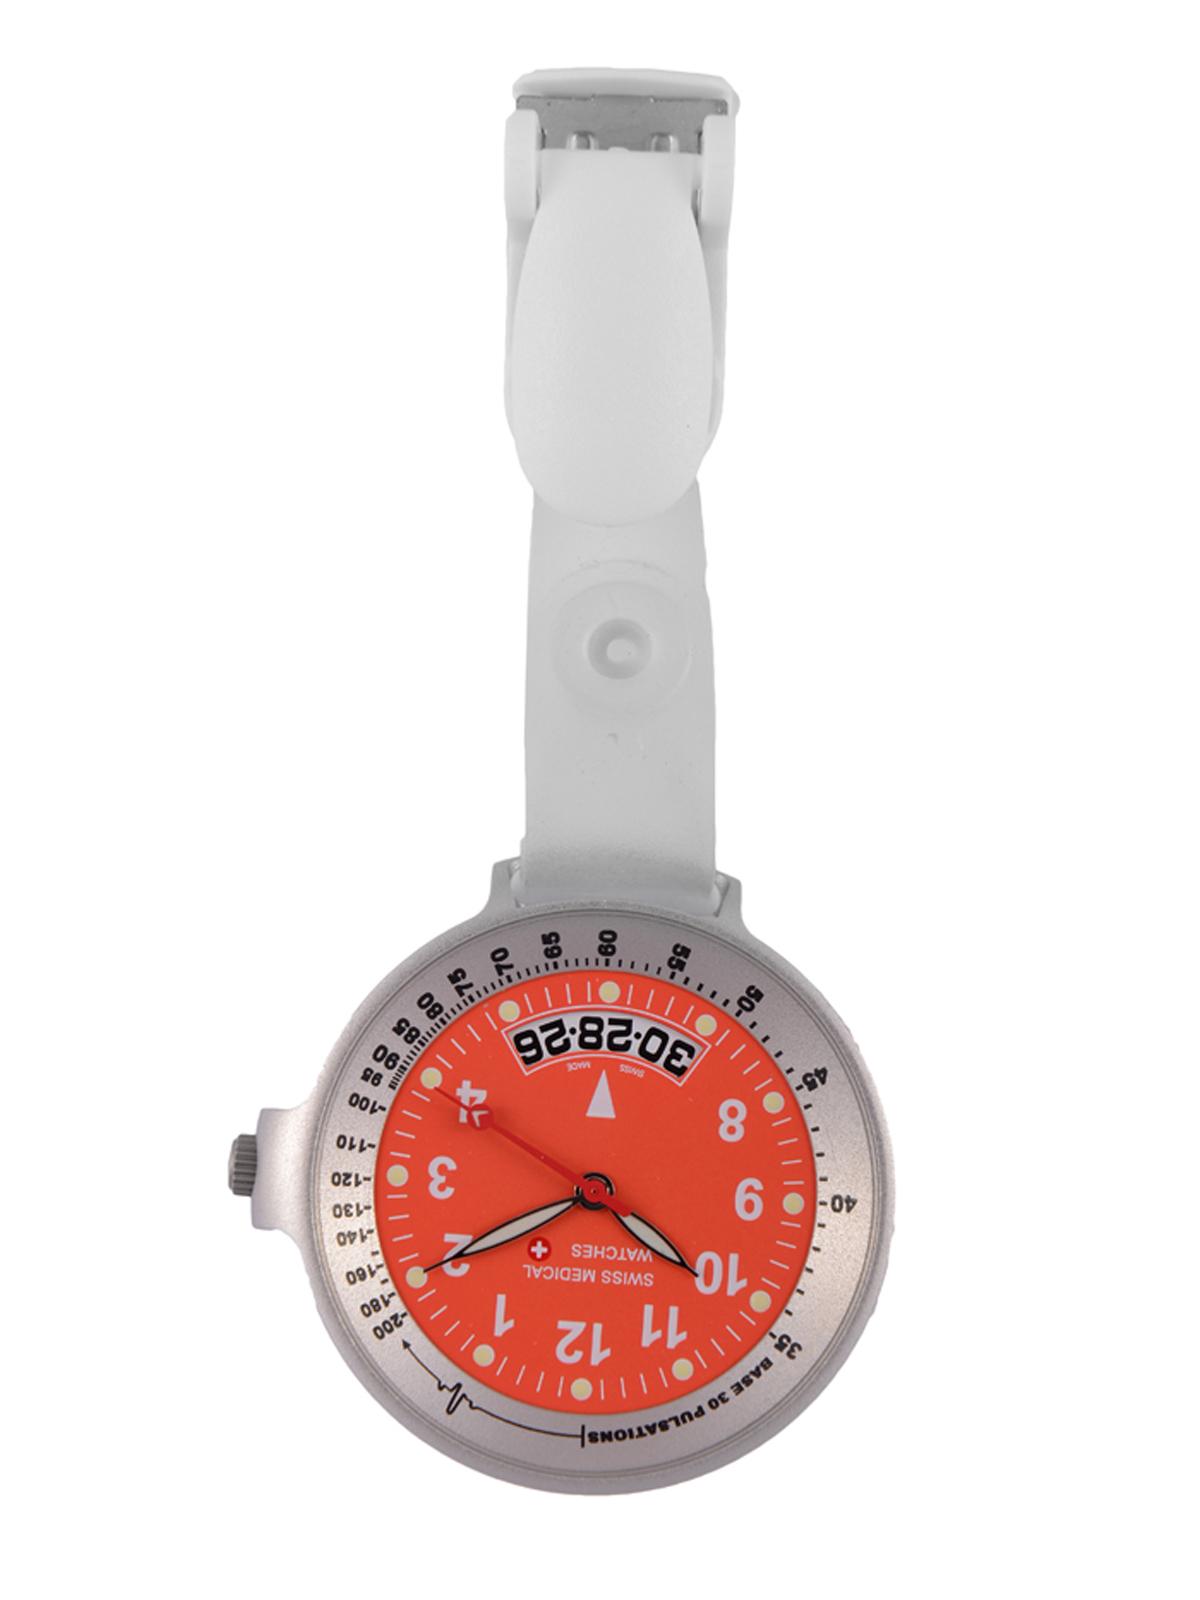 Relojes médicos Swiss medical